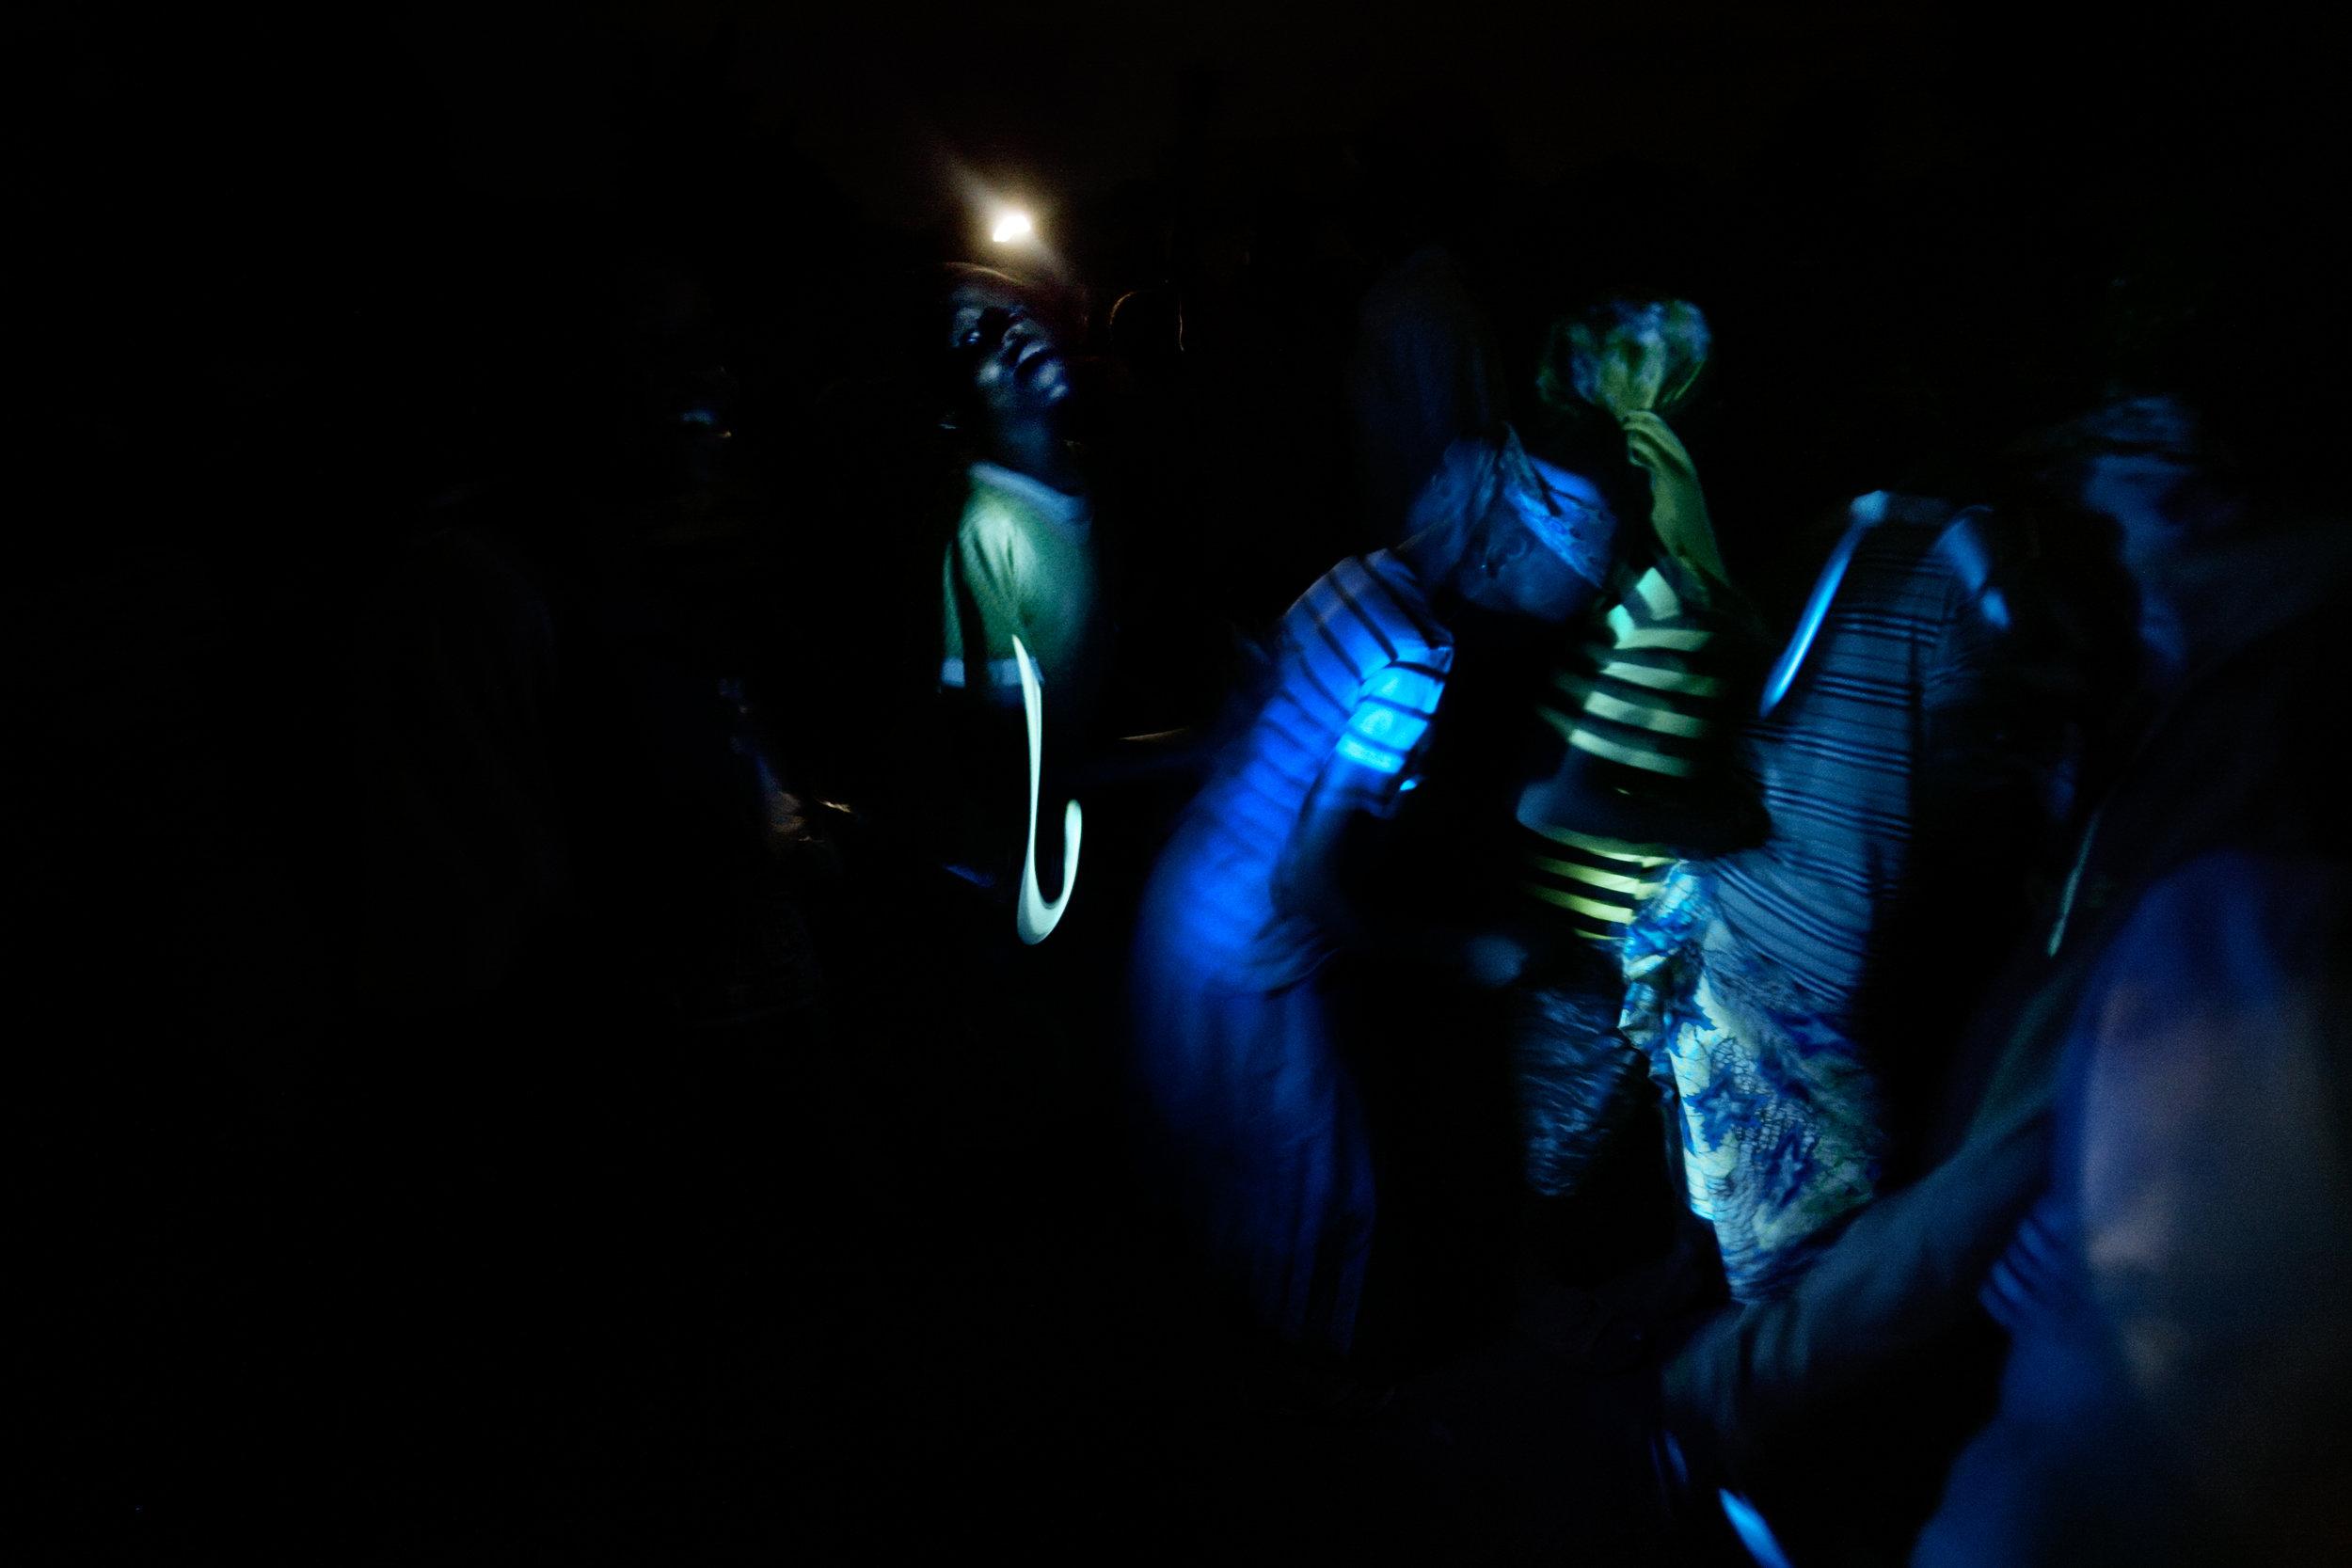 Children dance by flashlight outside of Wantugu, Northern Region, Ghana on June 30, 2007.